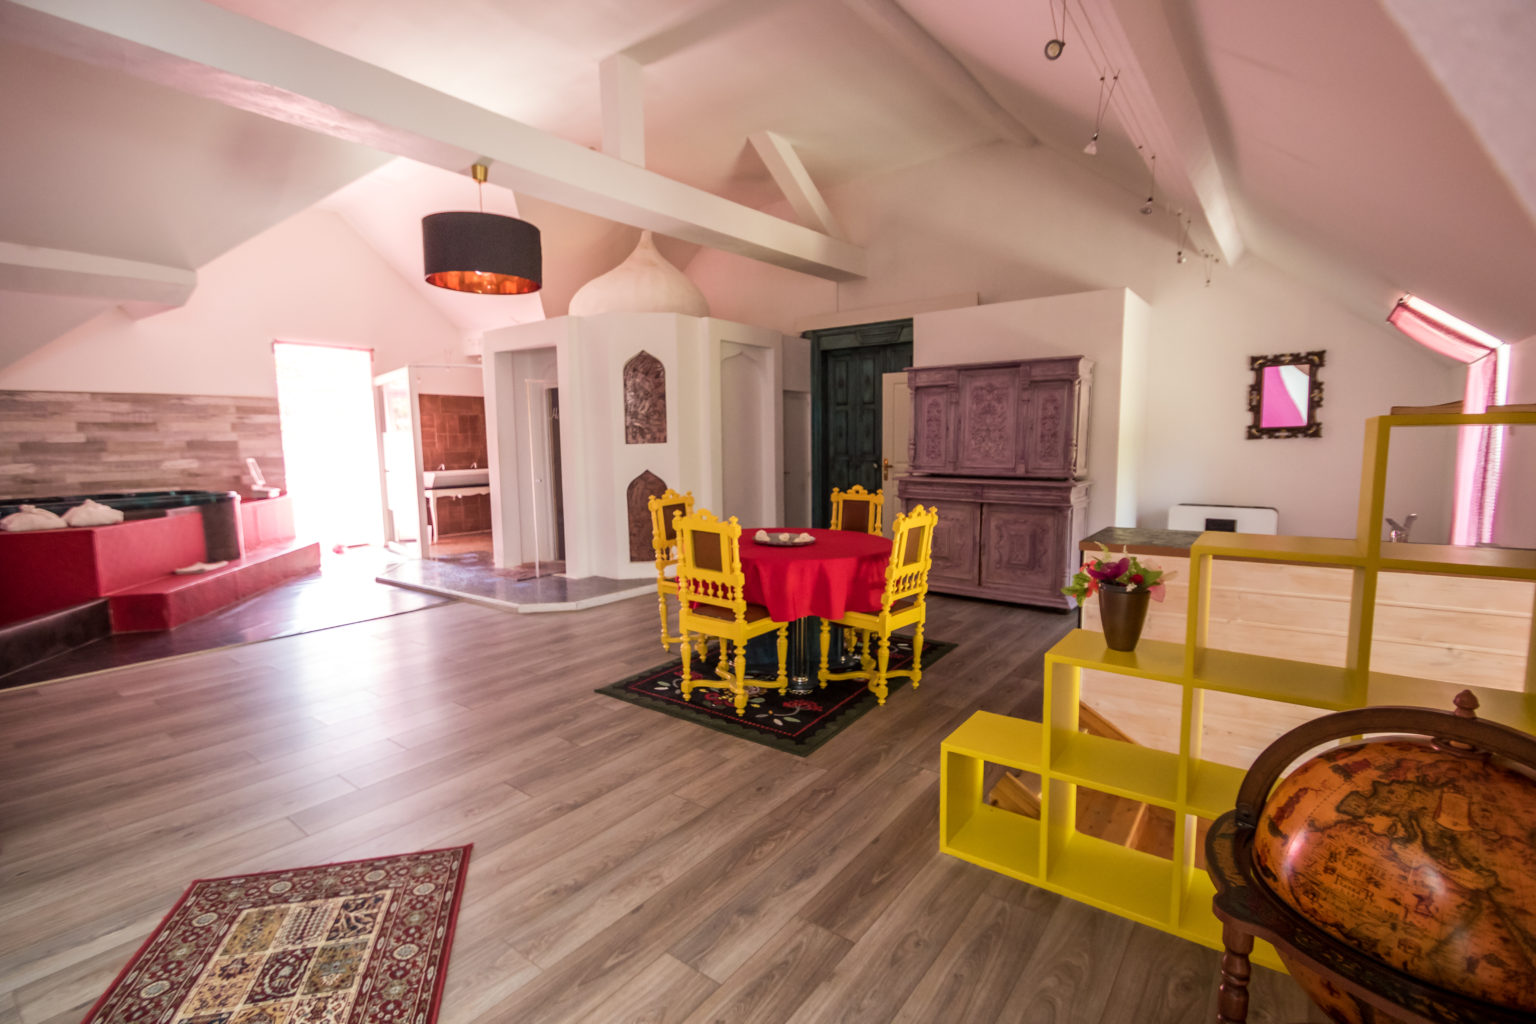 LA FONT VINEUSE HOTEL & SPA - HEBERGEMENT CHARME & INSOLITE 2019-0083LA FONT VINEUSE HOTEL & SPA